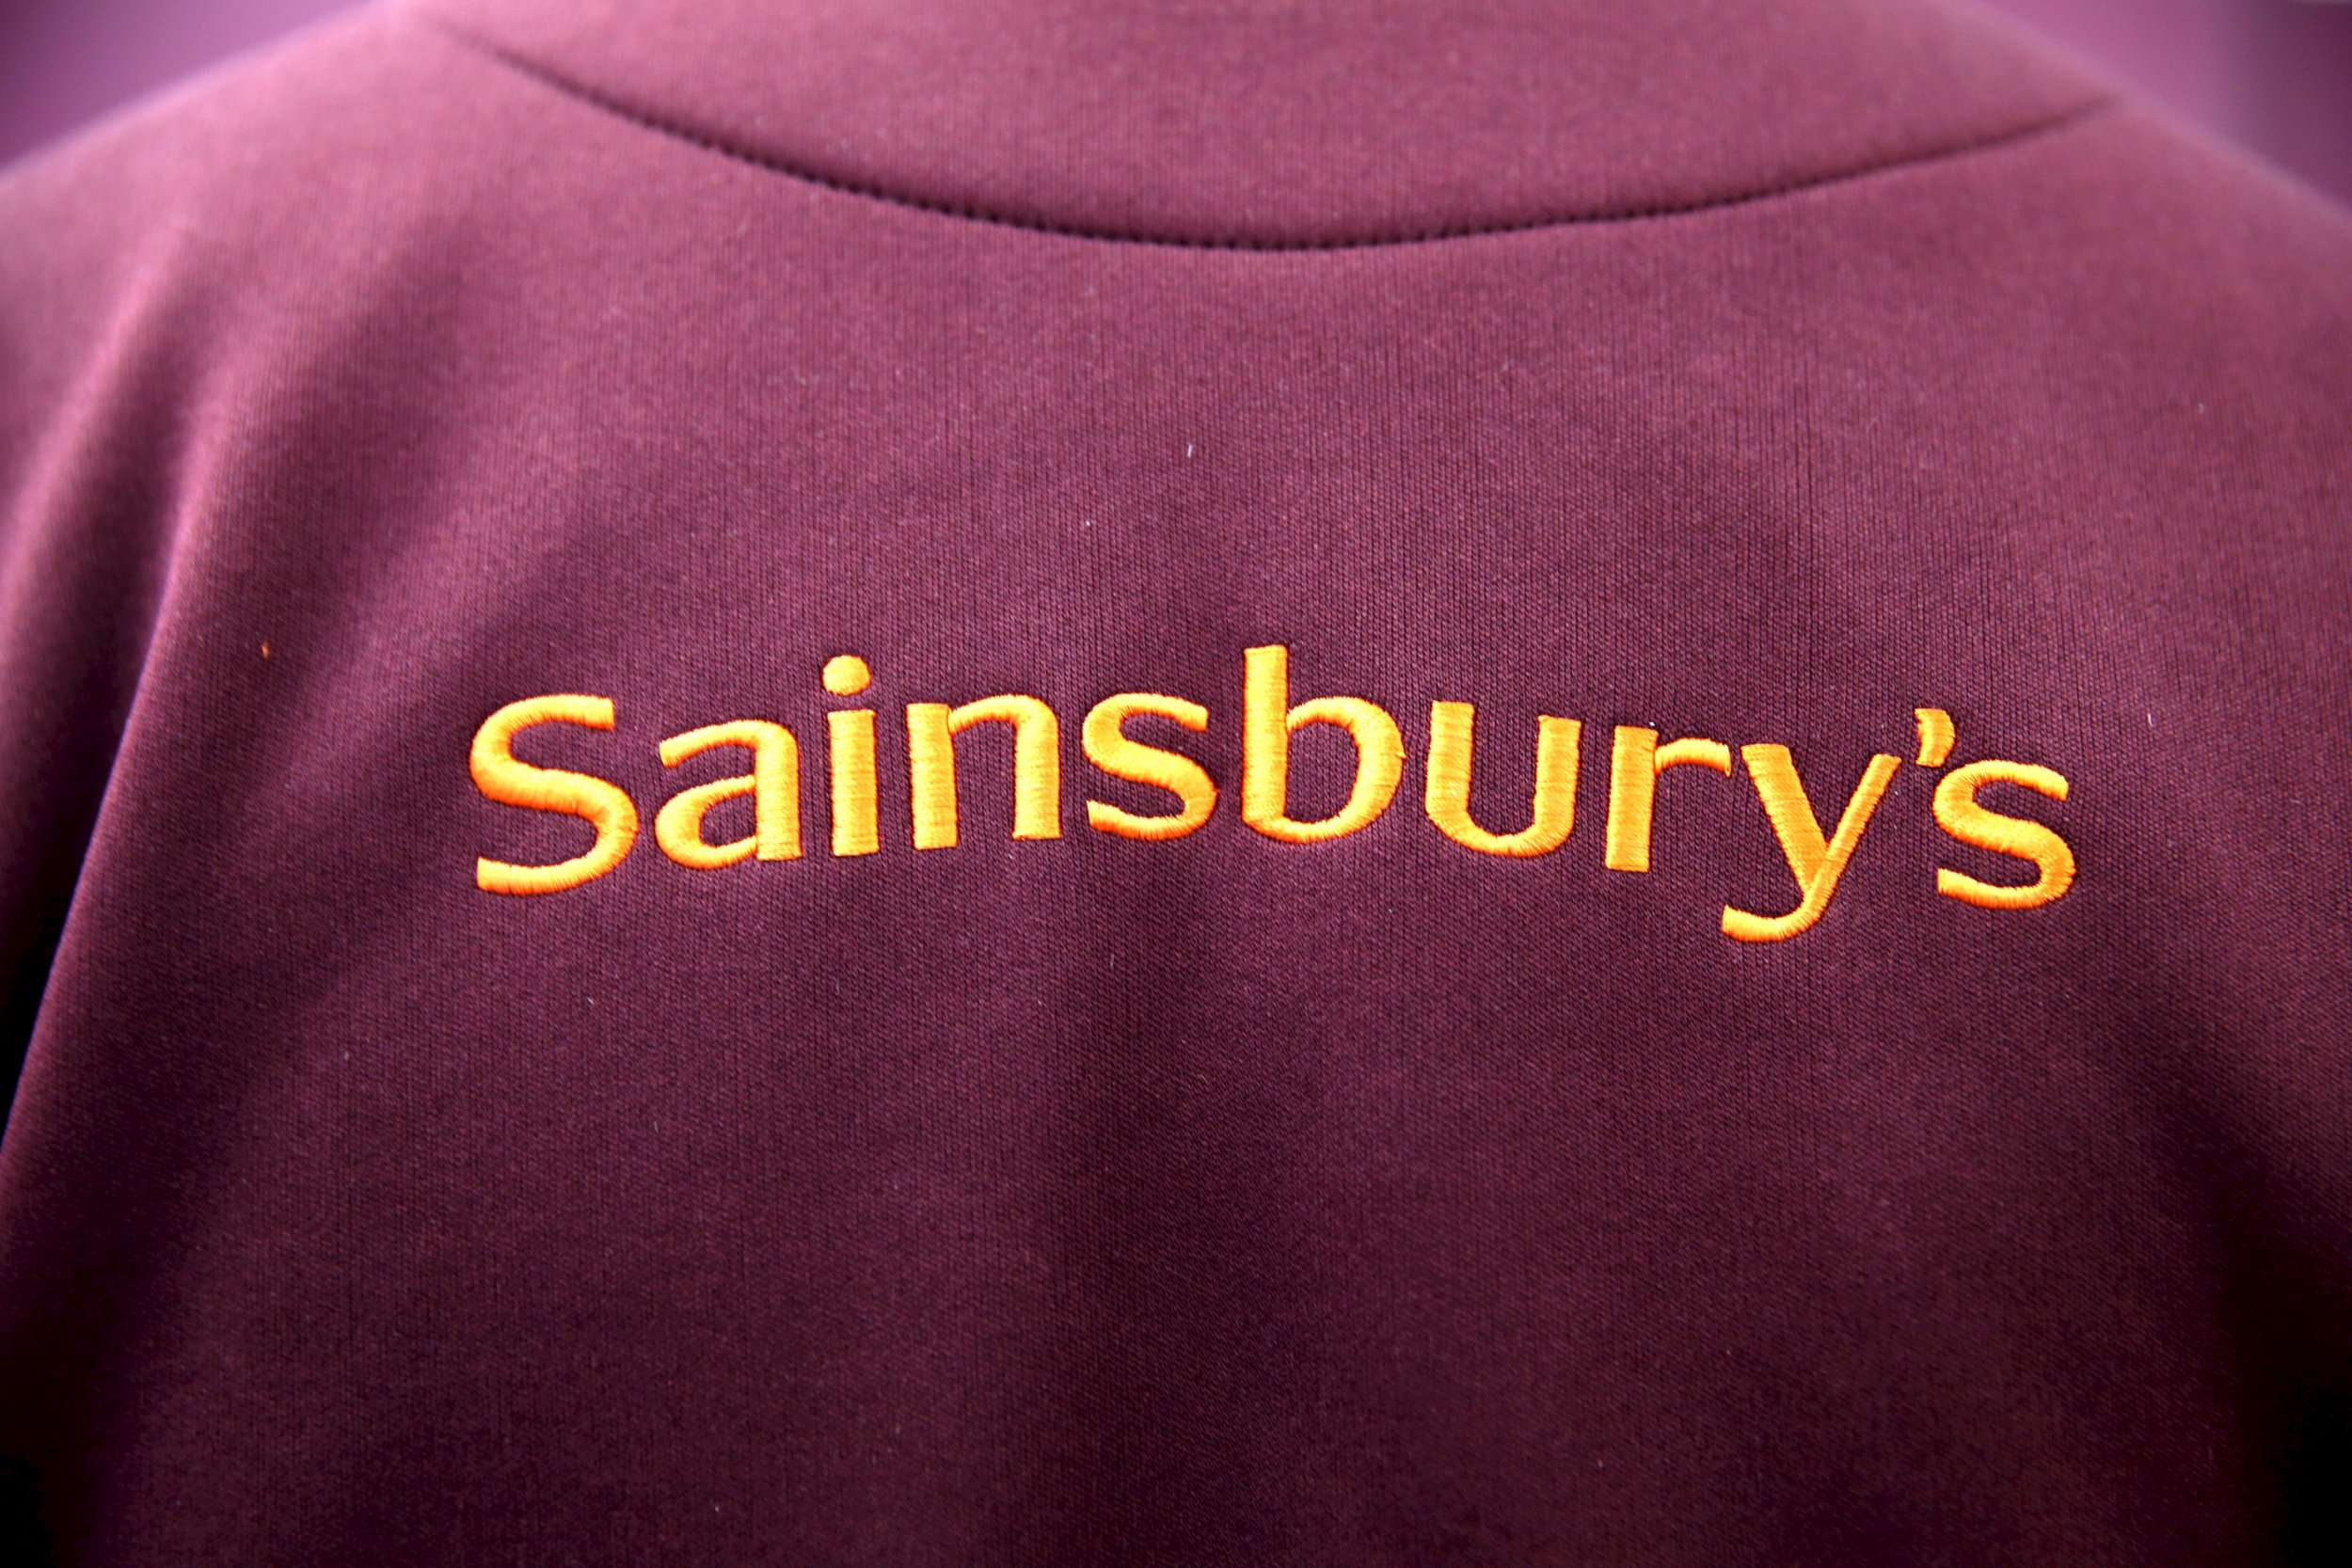 Sainsbury's uniform